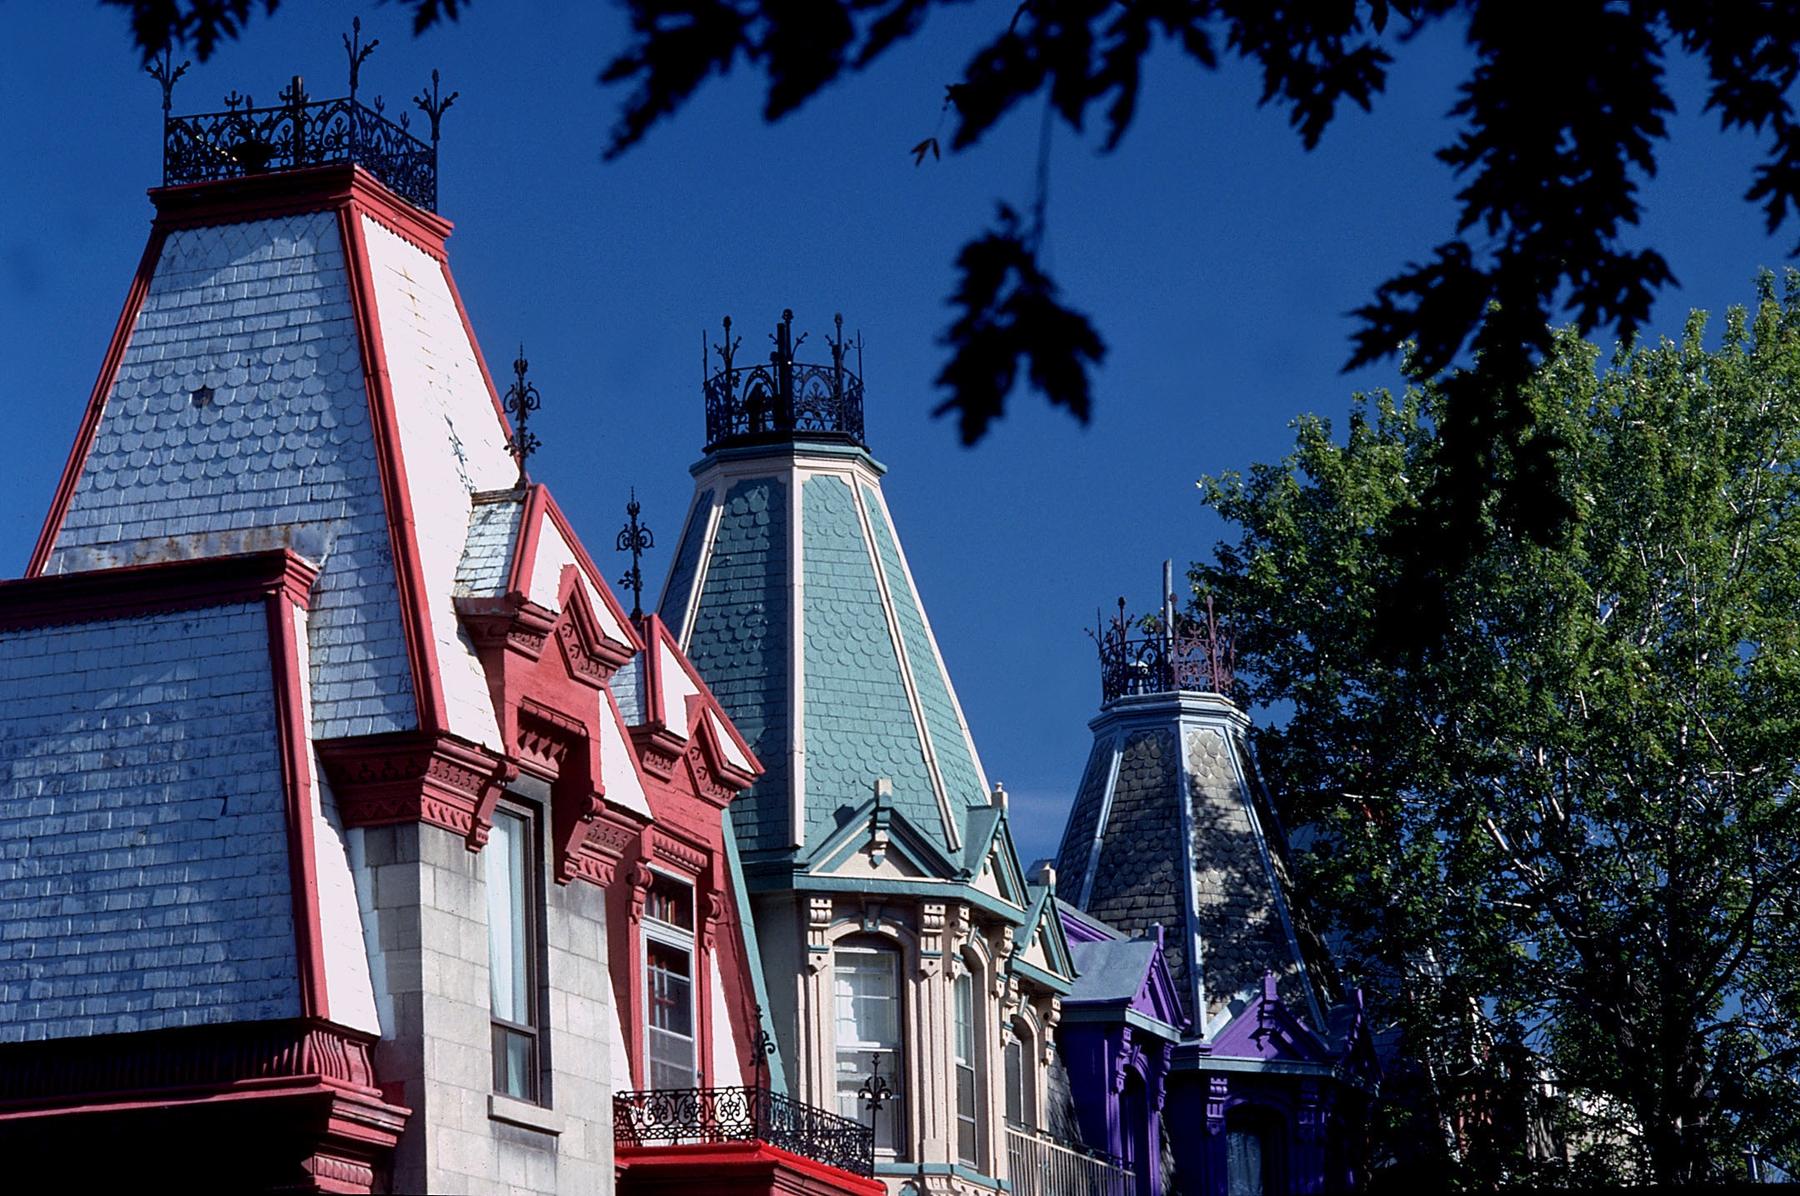 maisons rue St. Denis en Montreal